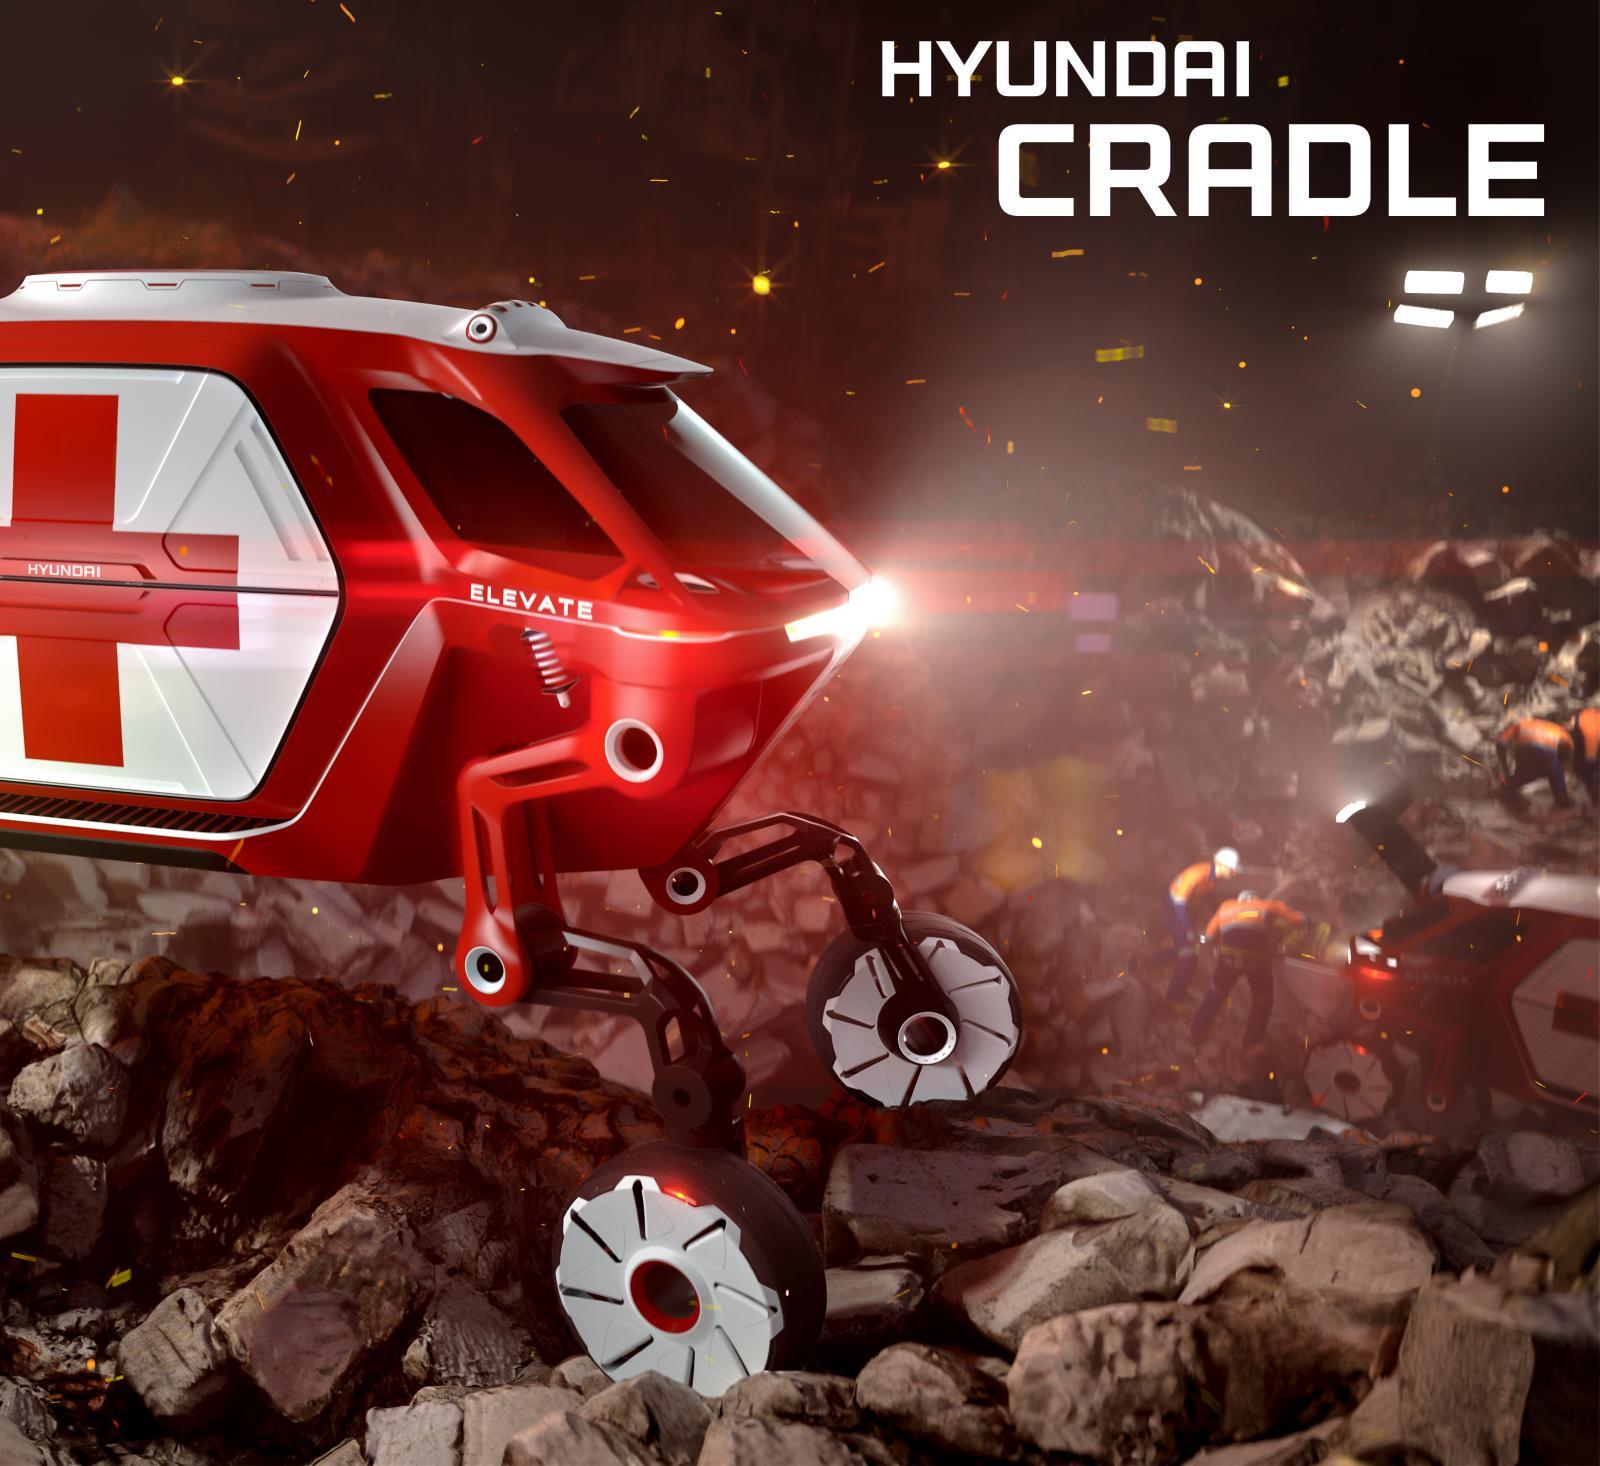 Hyundai Cradle Concept